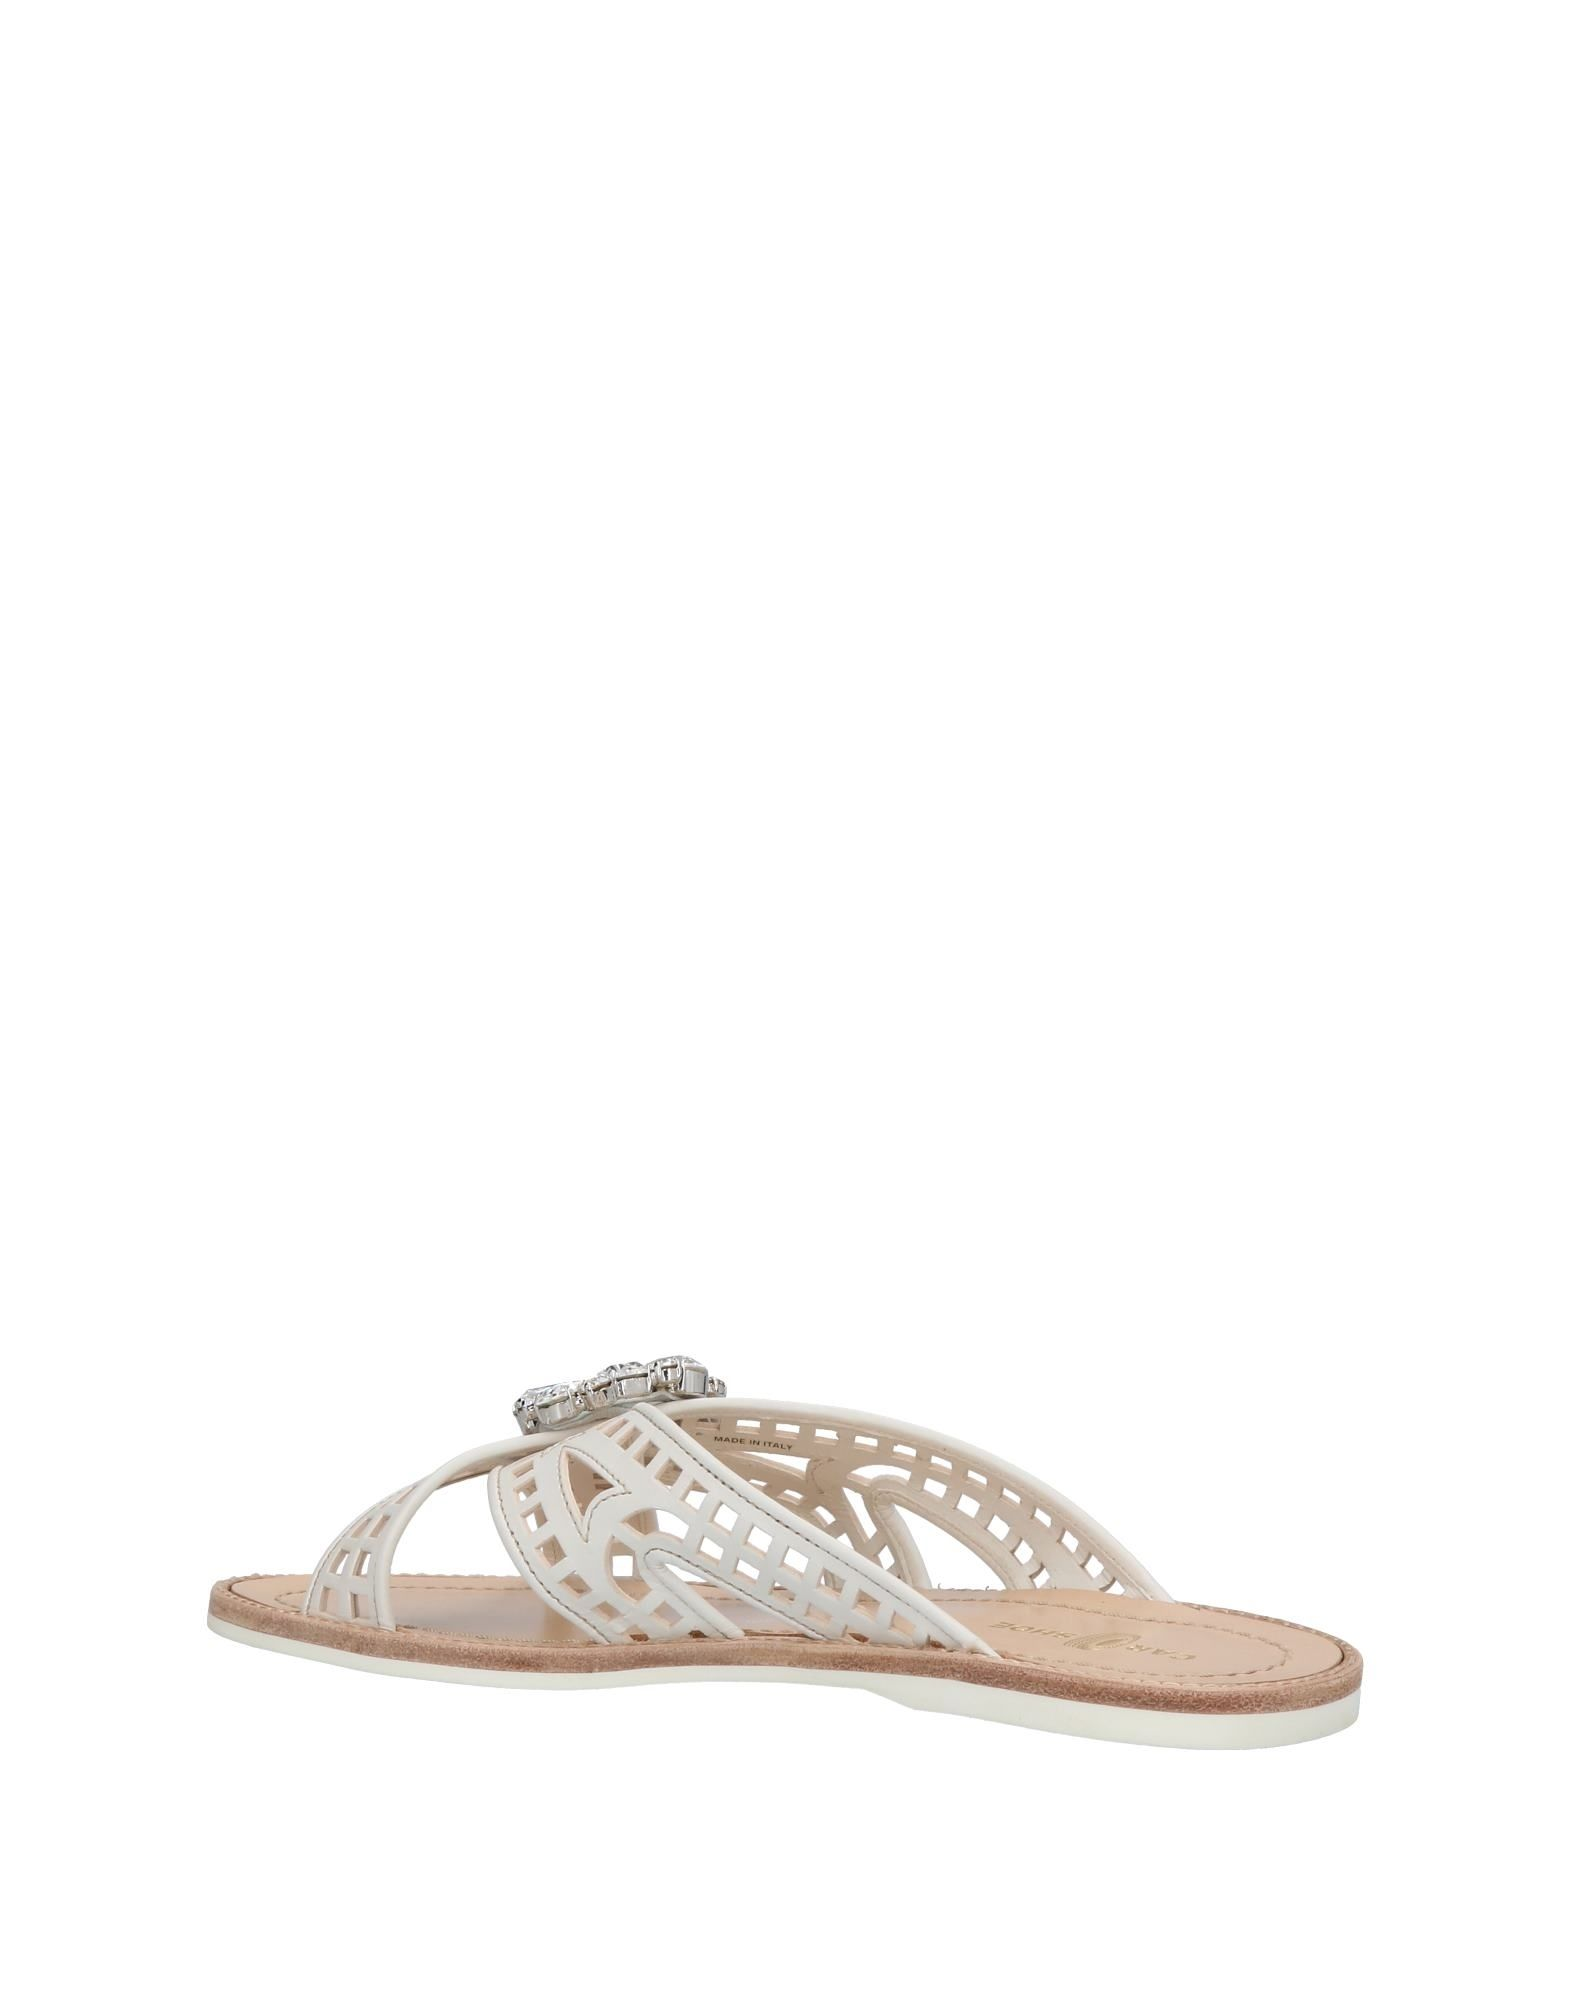 Haltbare Mode billige Schuhe Carshoe Sandalen Damen  11382215OJ Heiße Schuhe